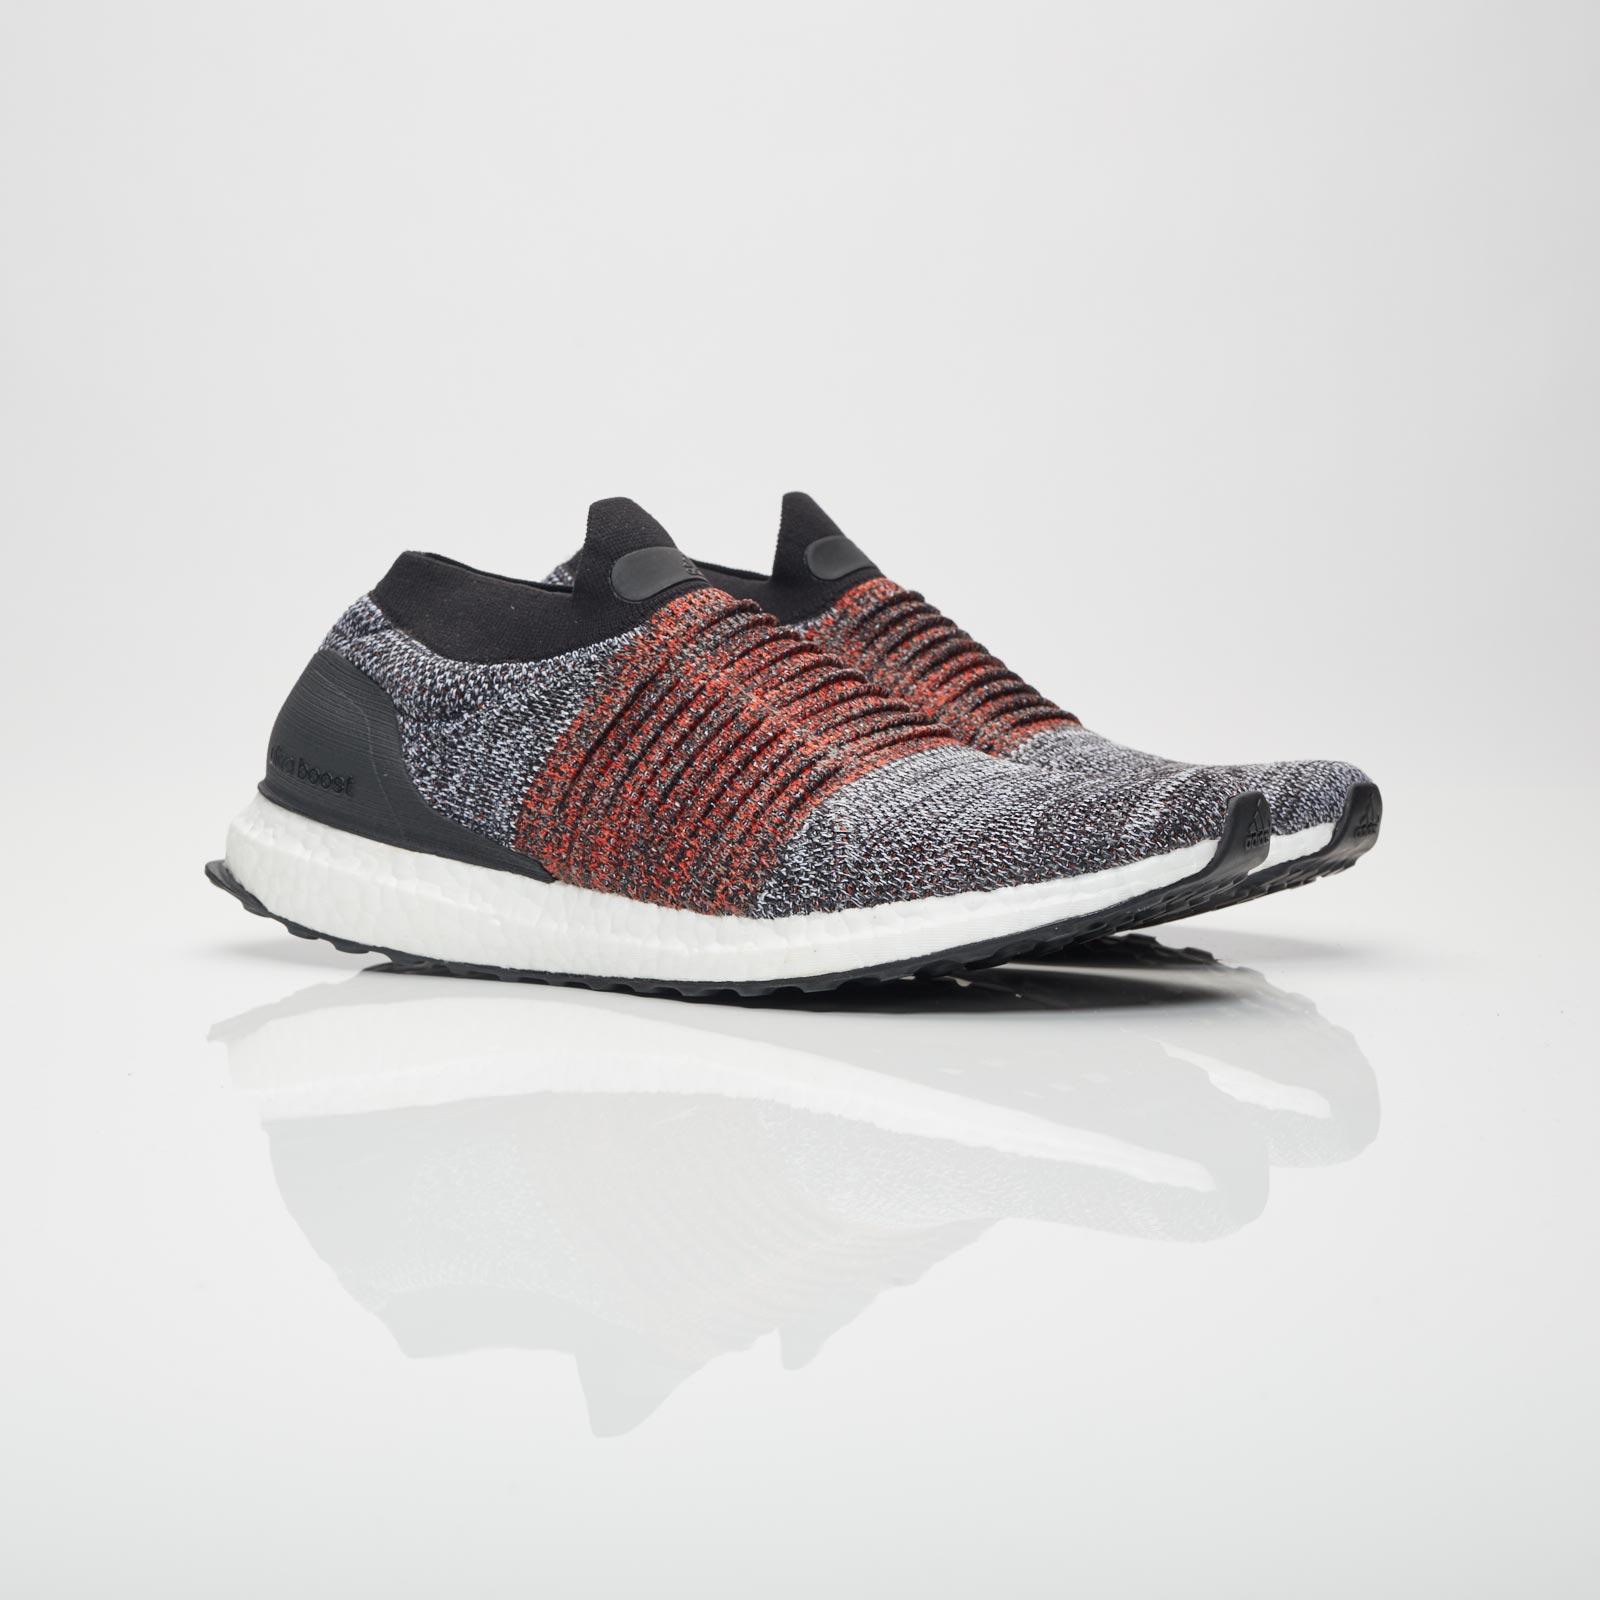 Adidas ultraboost laceless s80769 sneakersnstuff Sneakers